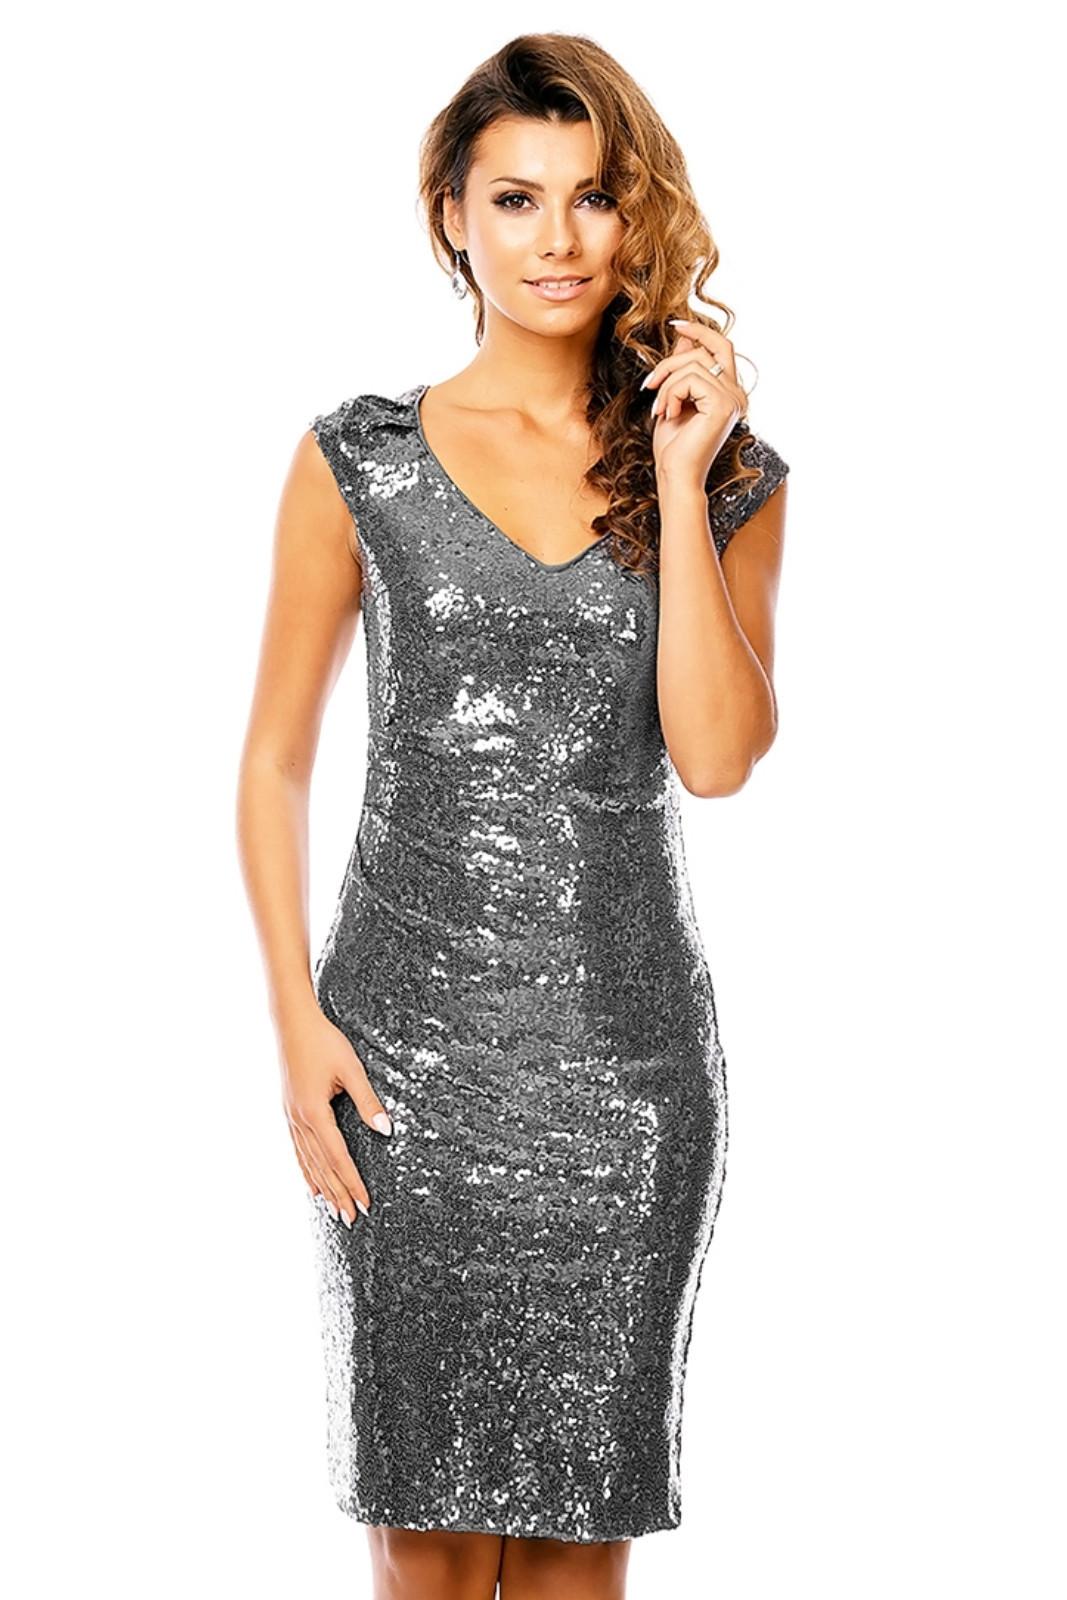 Spoločenské a plesové šaty flitrové značkové MAYAADI bez rukávov sivé - Sivá / S - MAYAADI šedá S